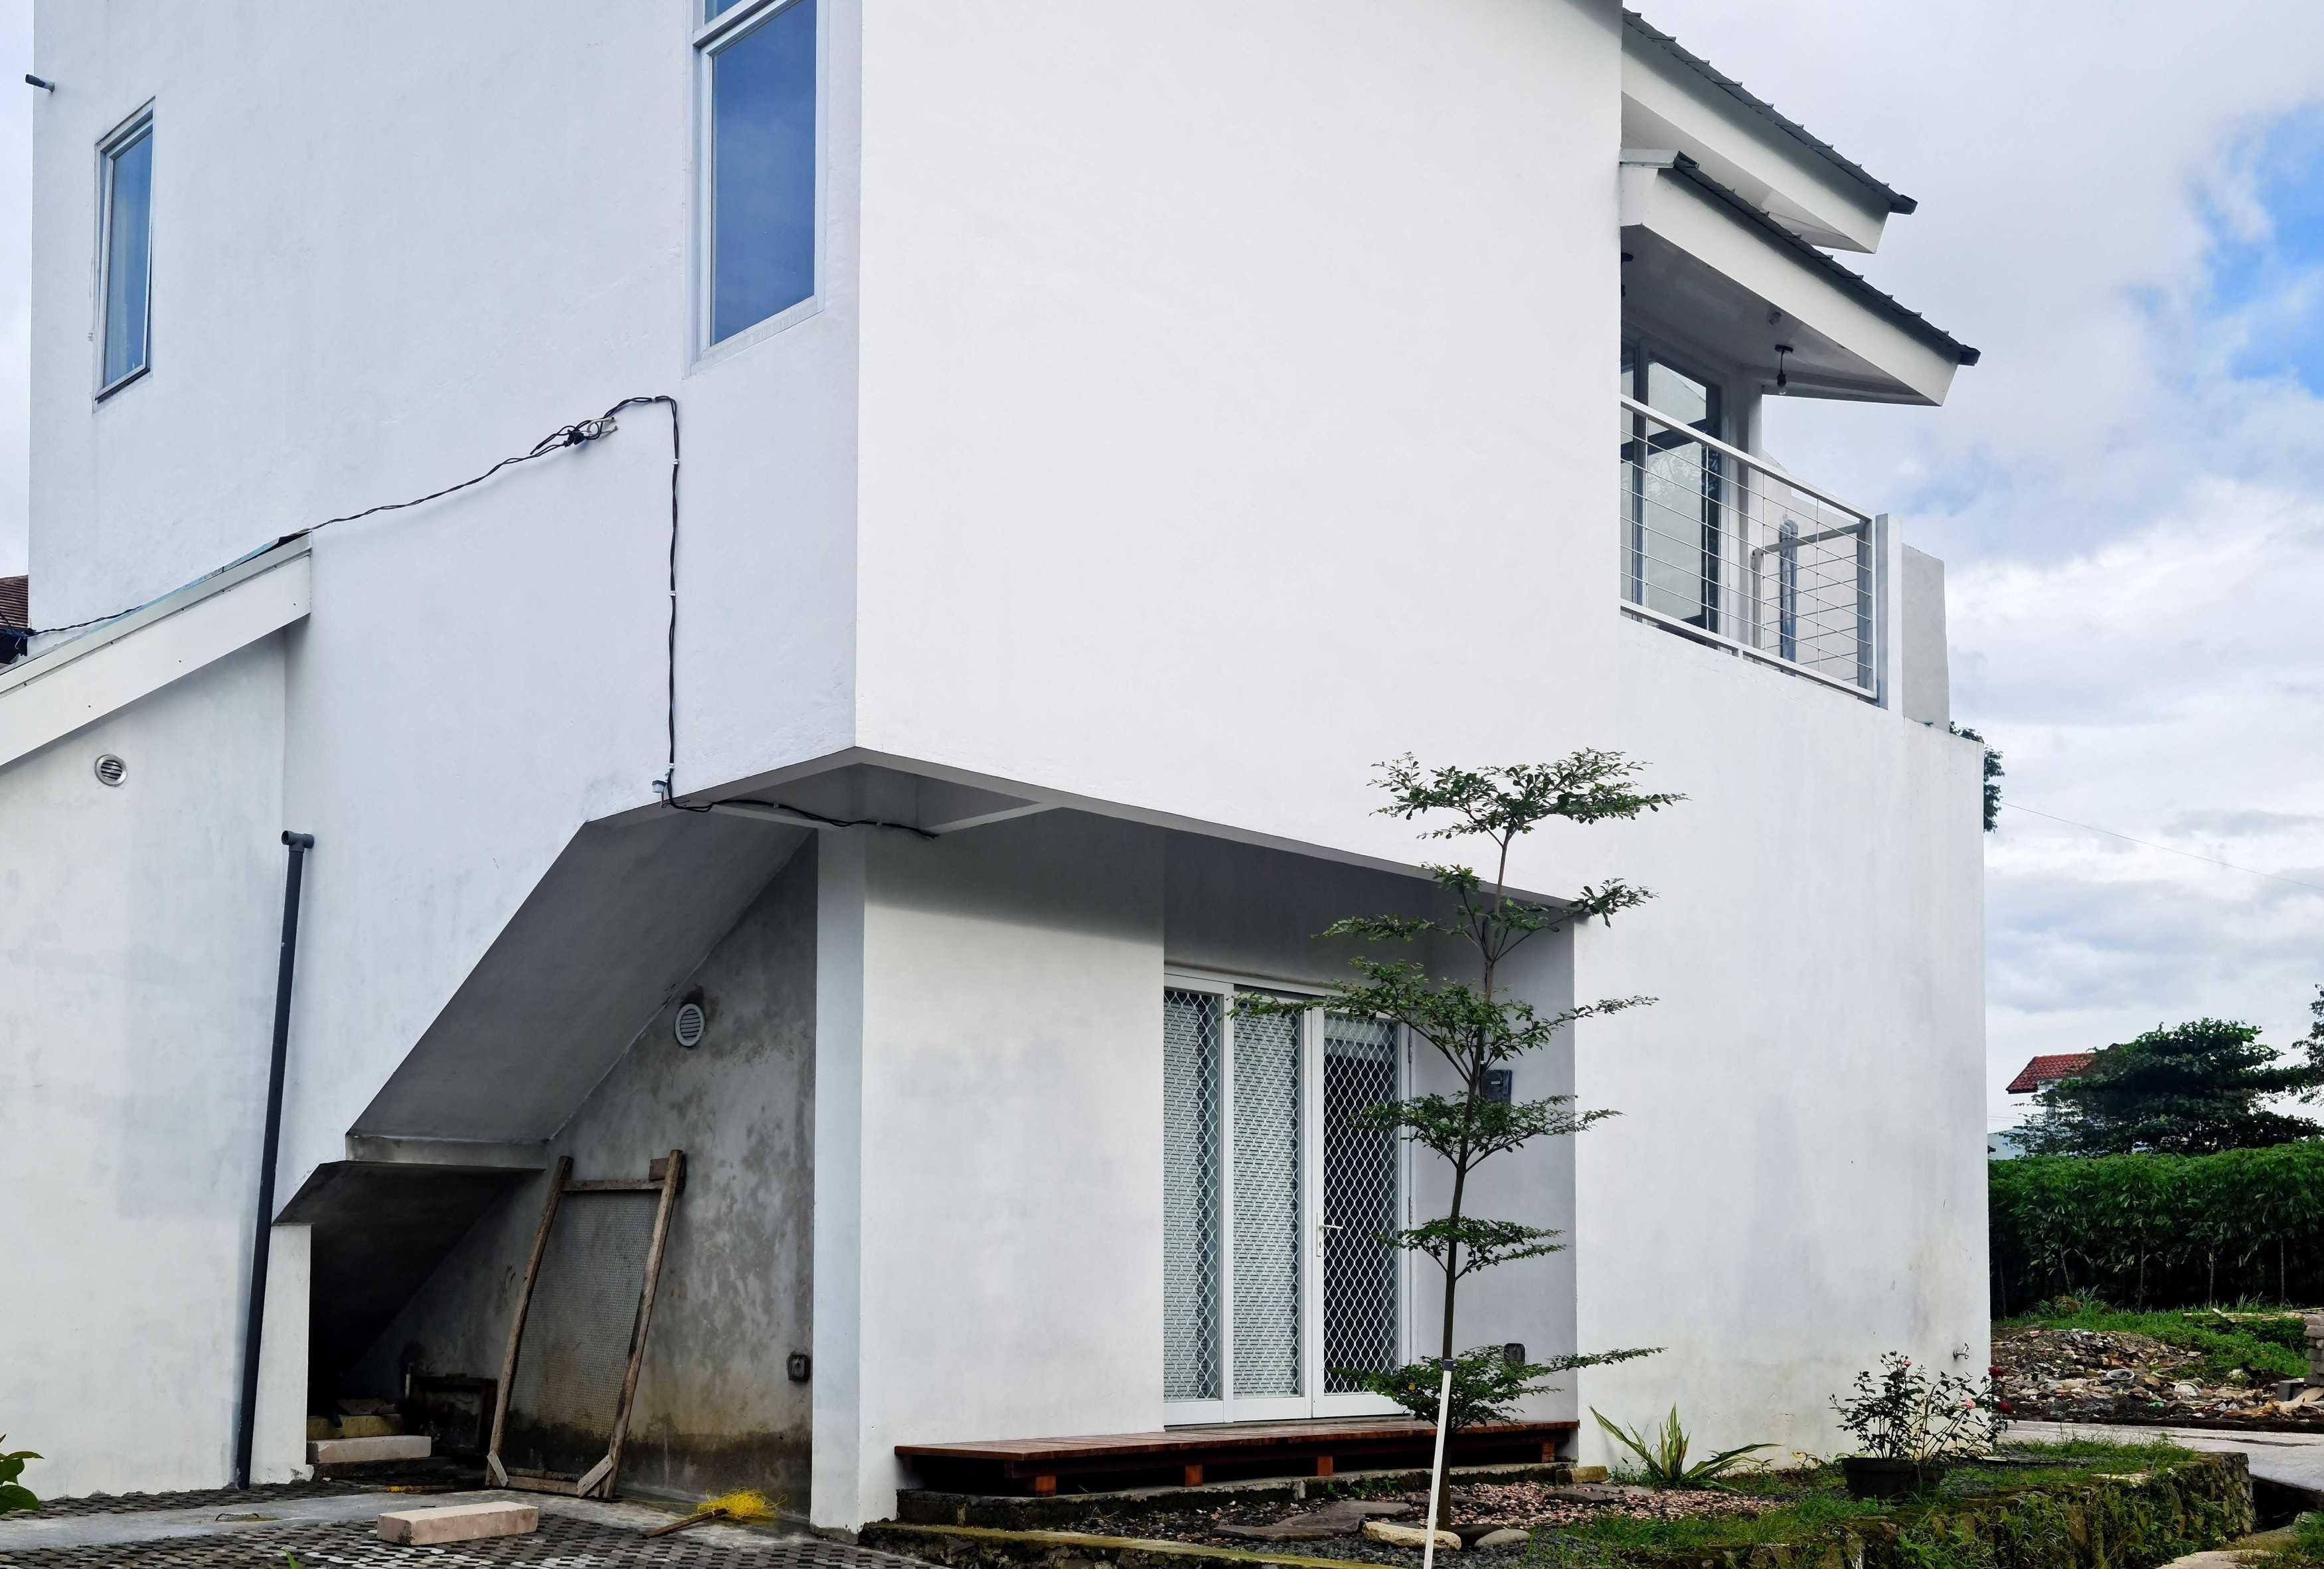 Gfs Architect T&d House Semarang, Jawa Tengah, Indonesia Semarang, Jawa Tengah, Indonesia Gigih-F-Saputro-Td-House   111970